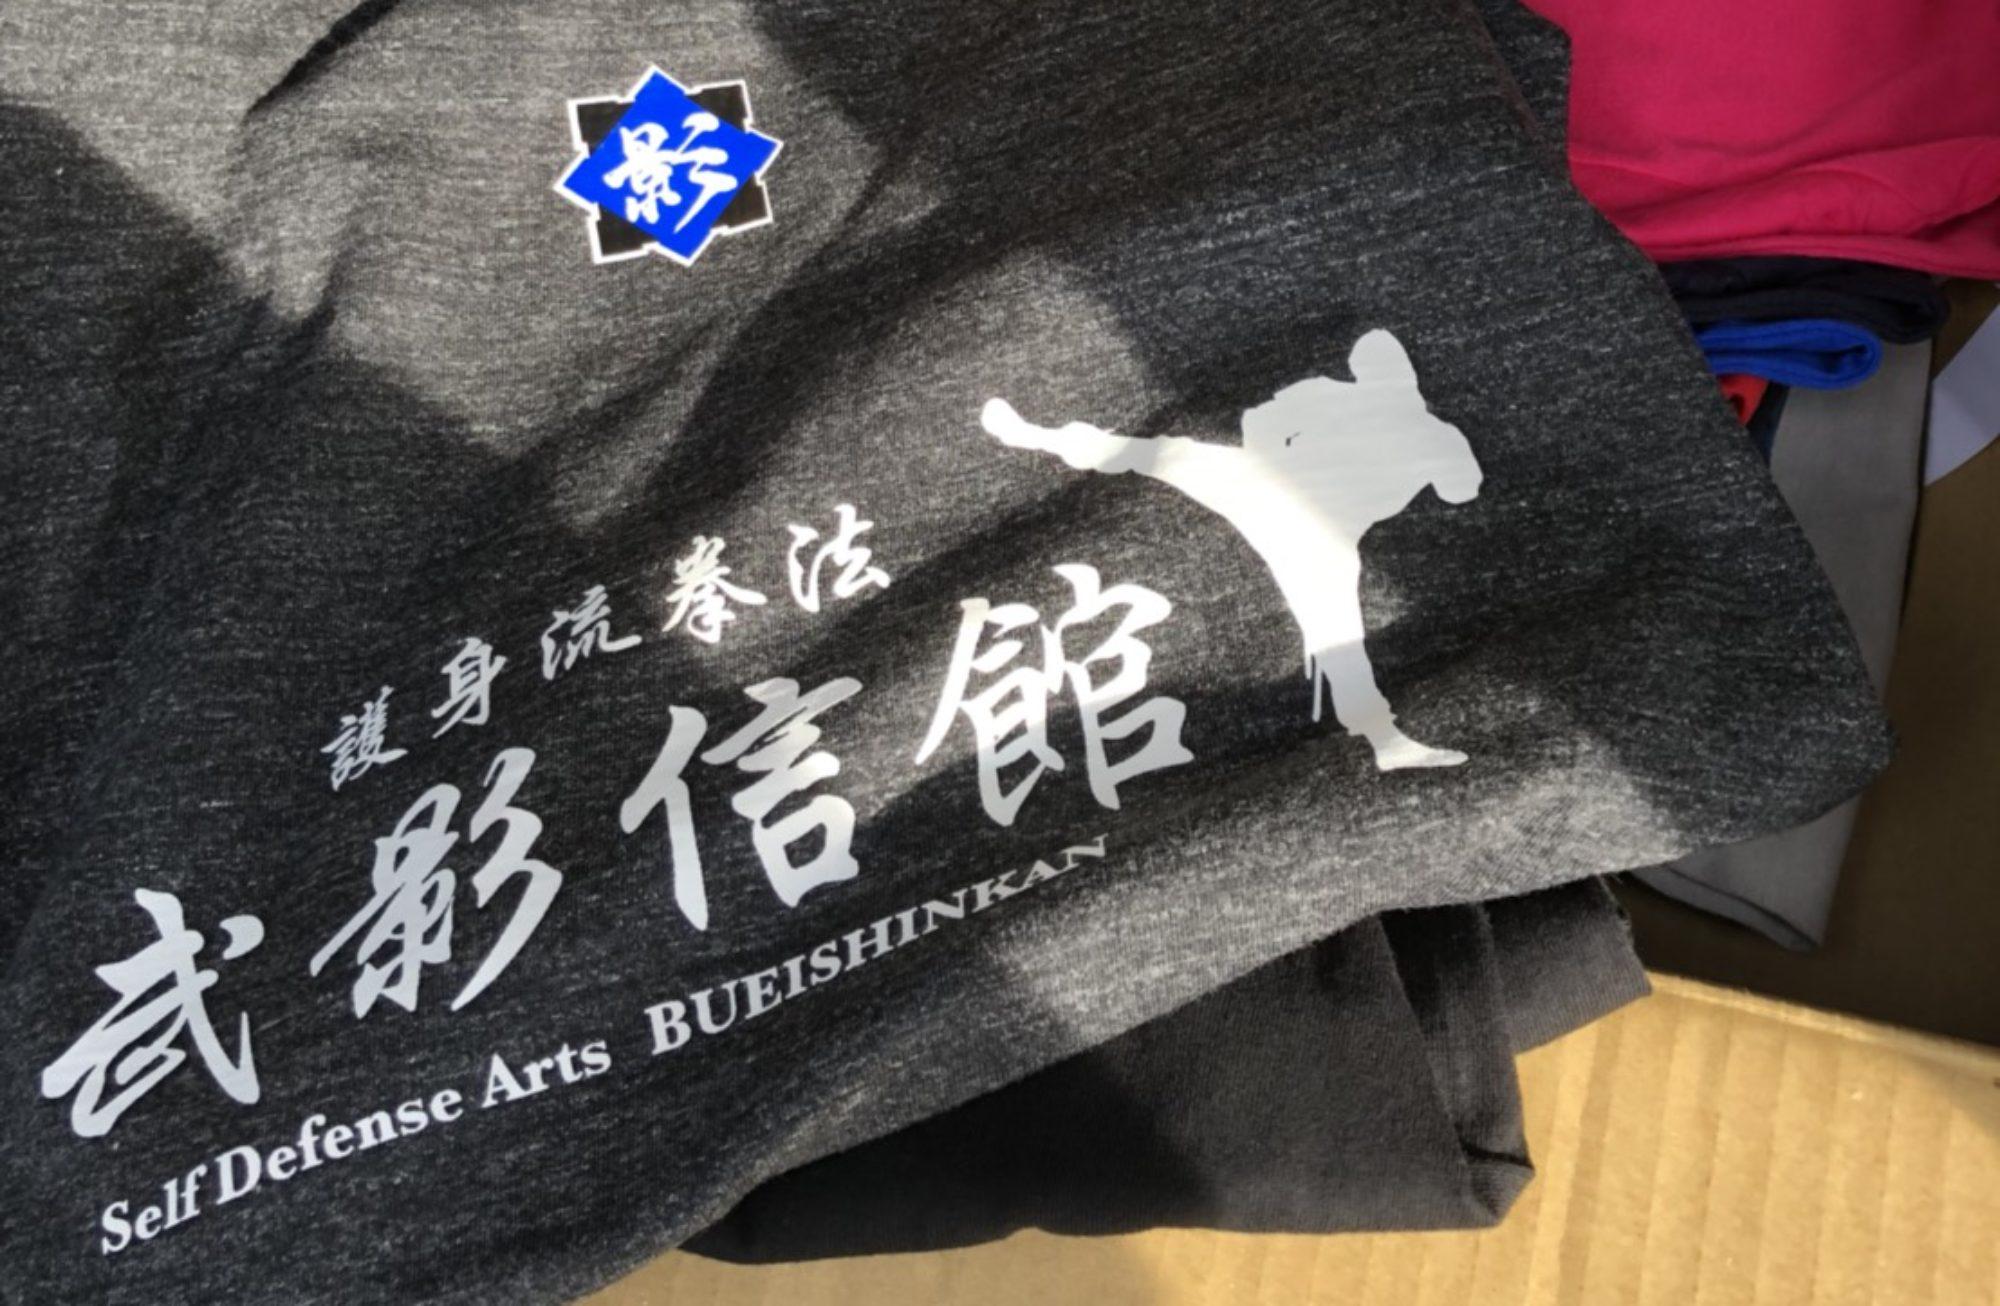 護身流拳法 武影信館 Bueishinkan